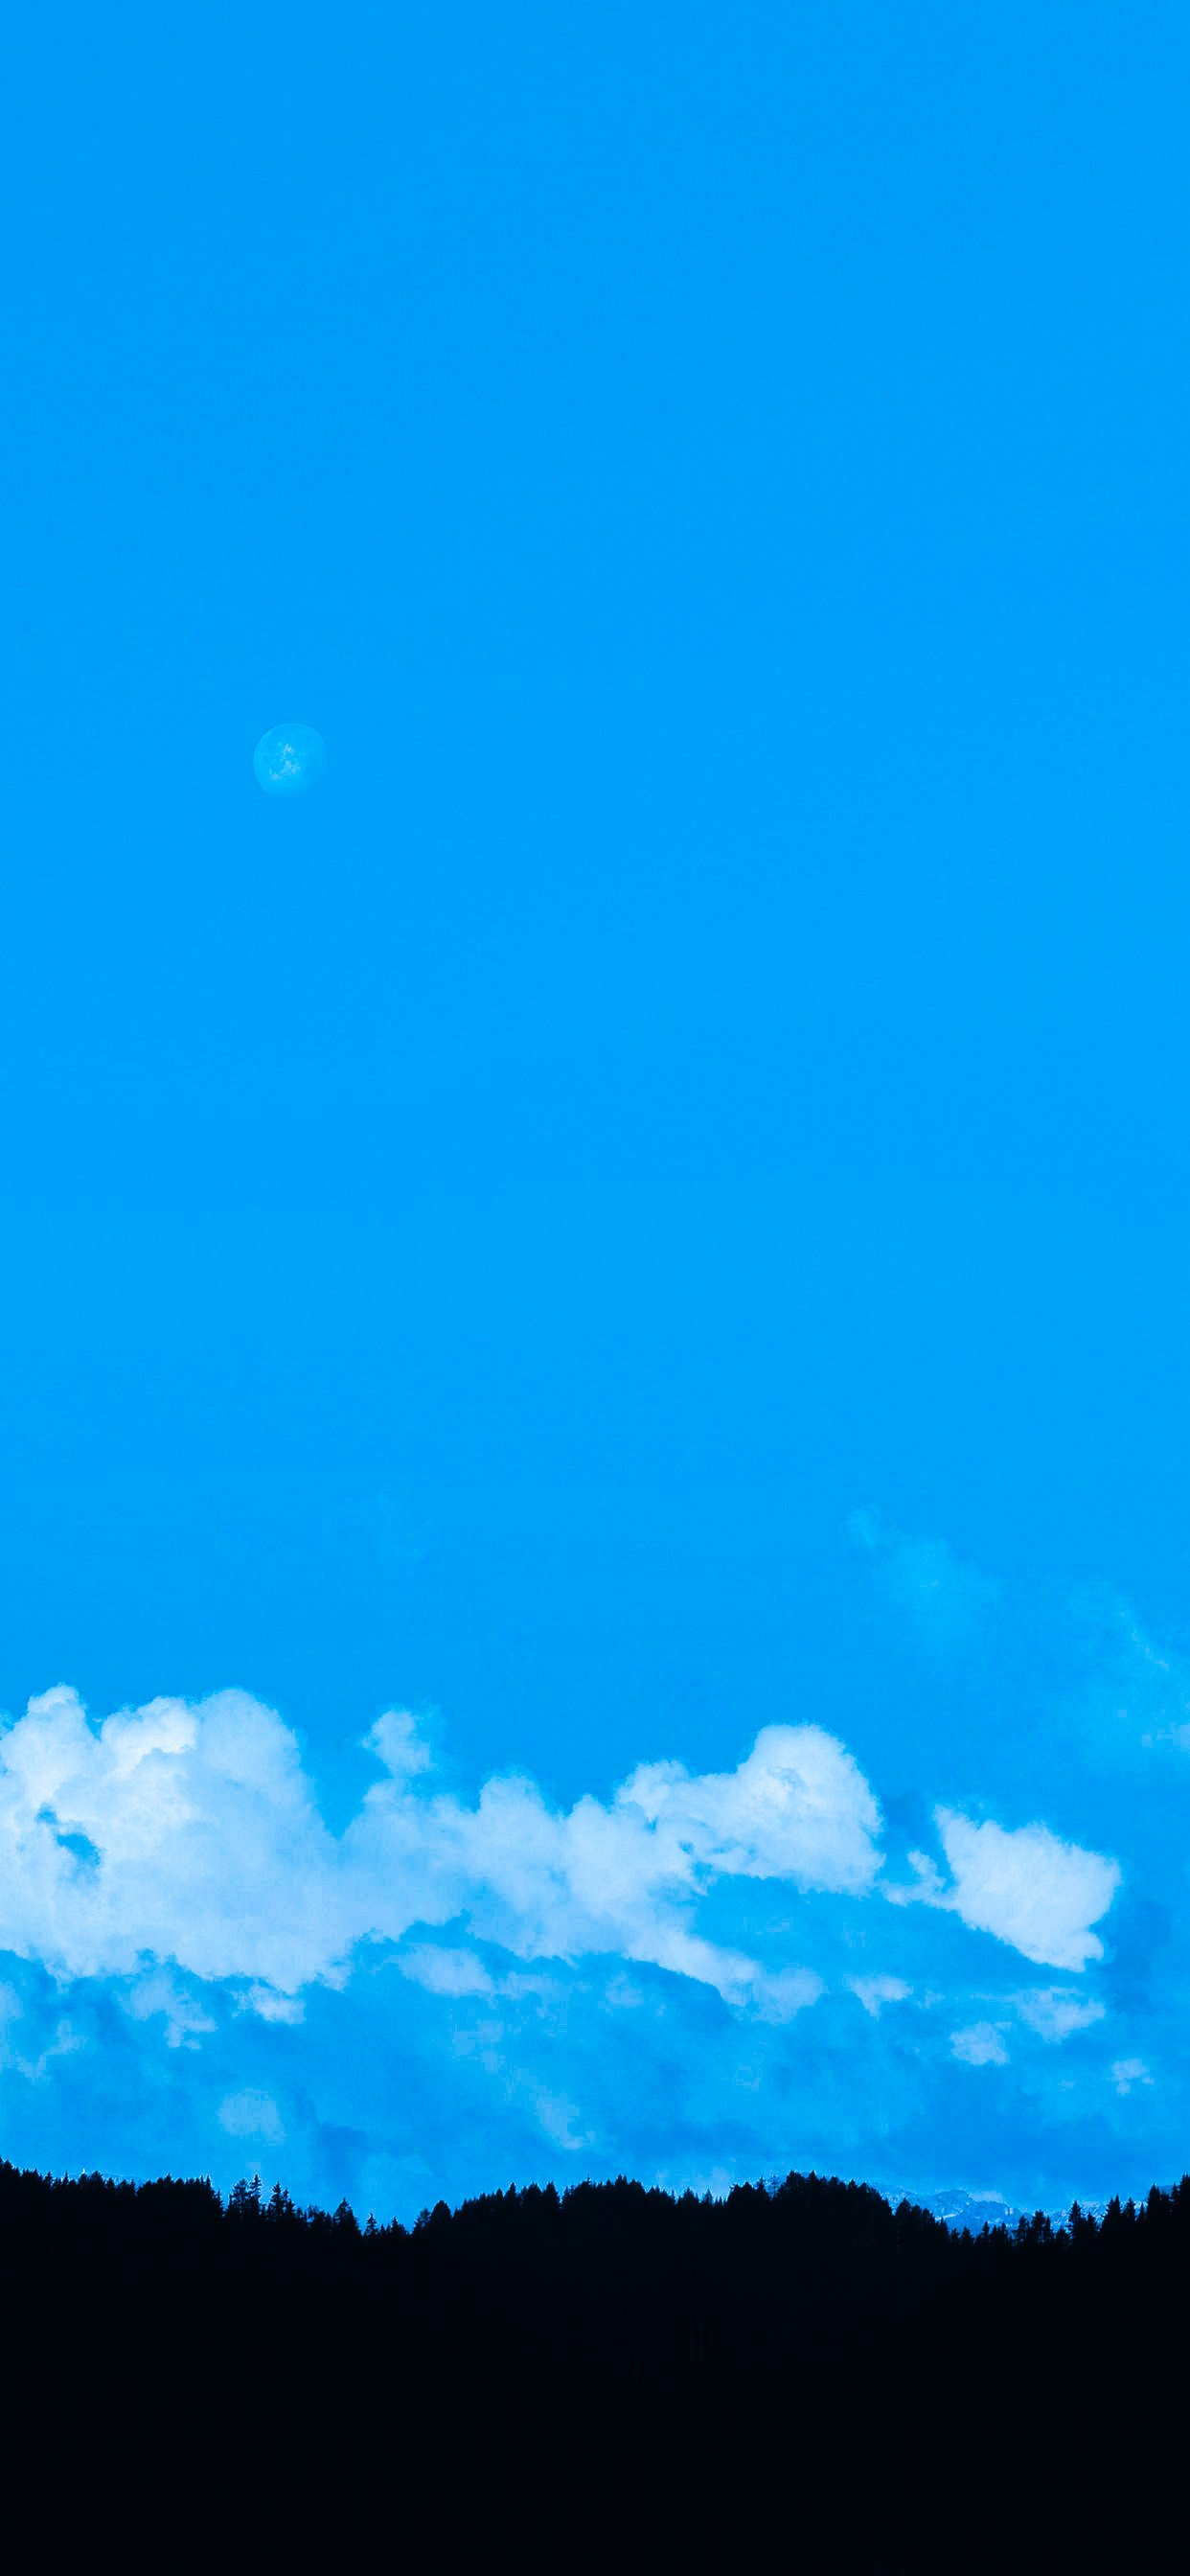 iPhone 12 Blue Original Wallpaper 1242x2688